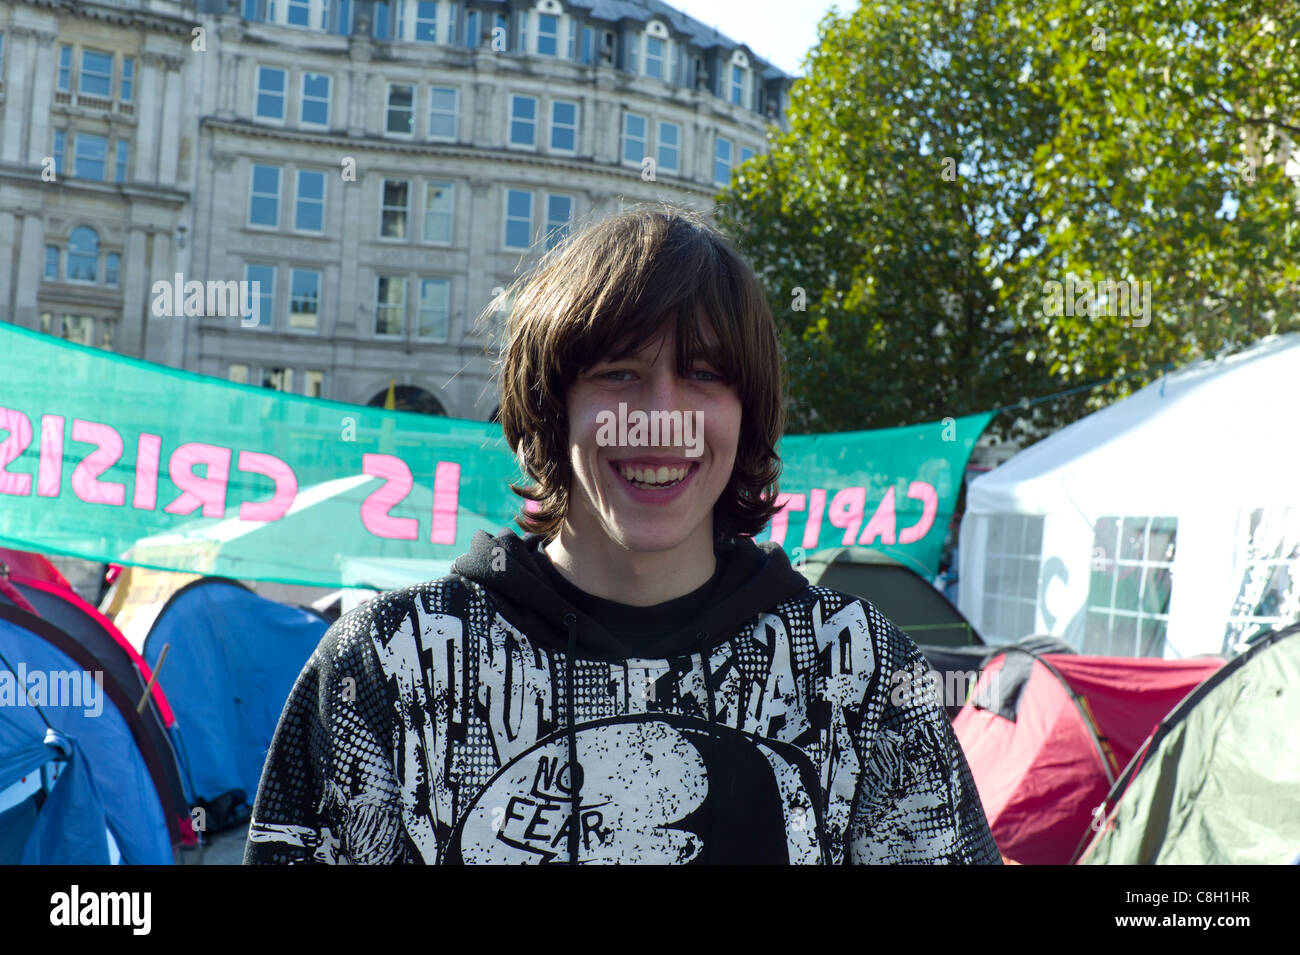 Demonstrant oder Demonstrator auf der Anti-kapitalistischen Protest St.Paul's Cathedral, London Montag, 24. Stockbild